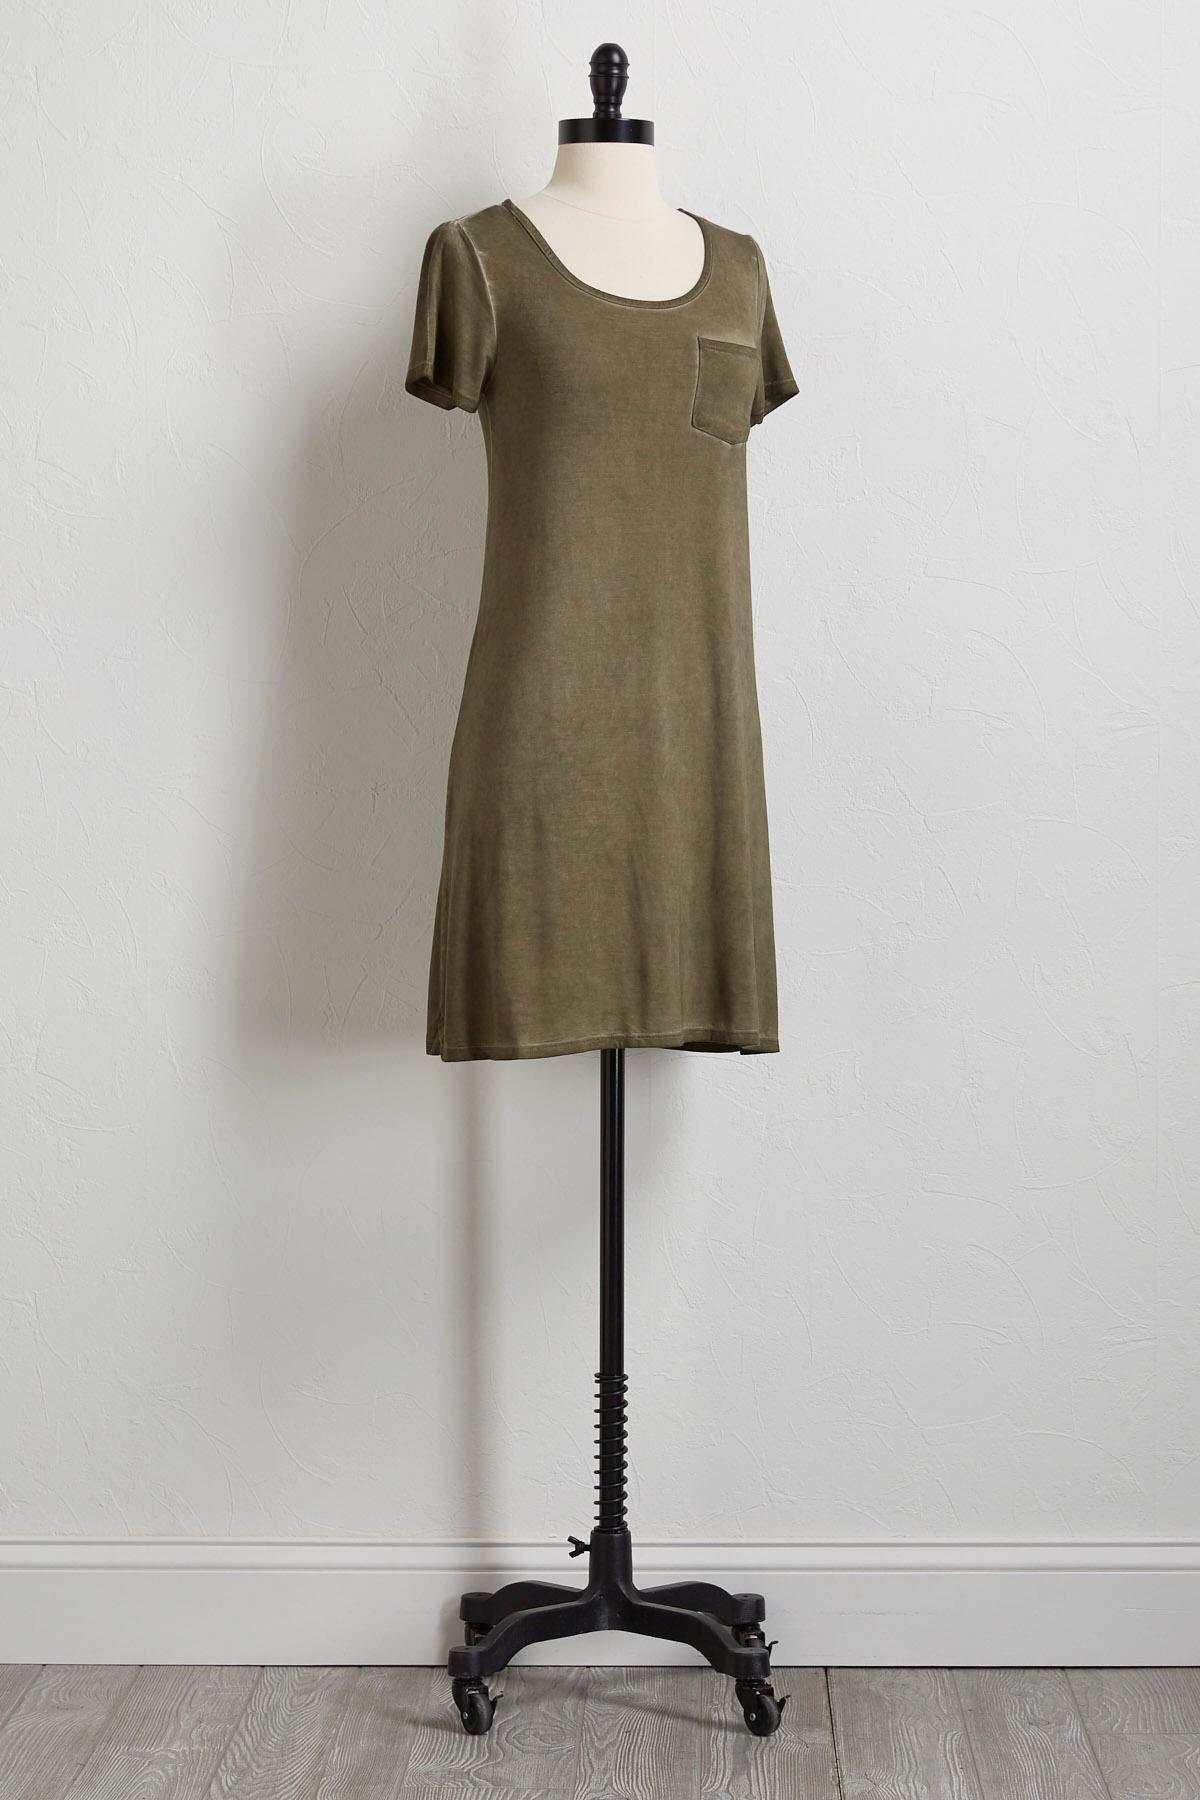 Olive Faded Wash T- Shirt Dress